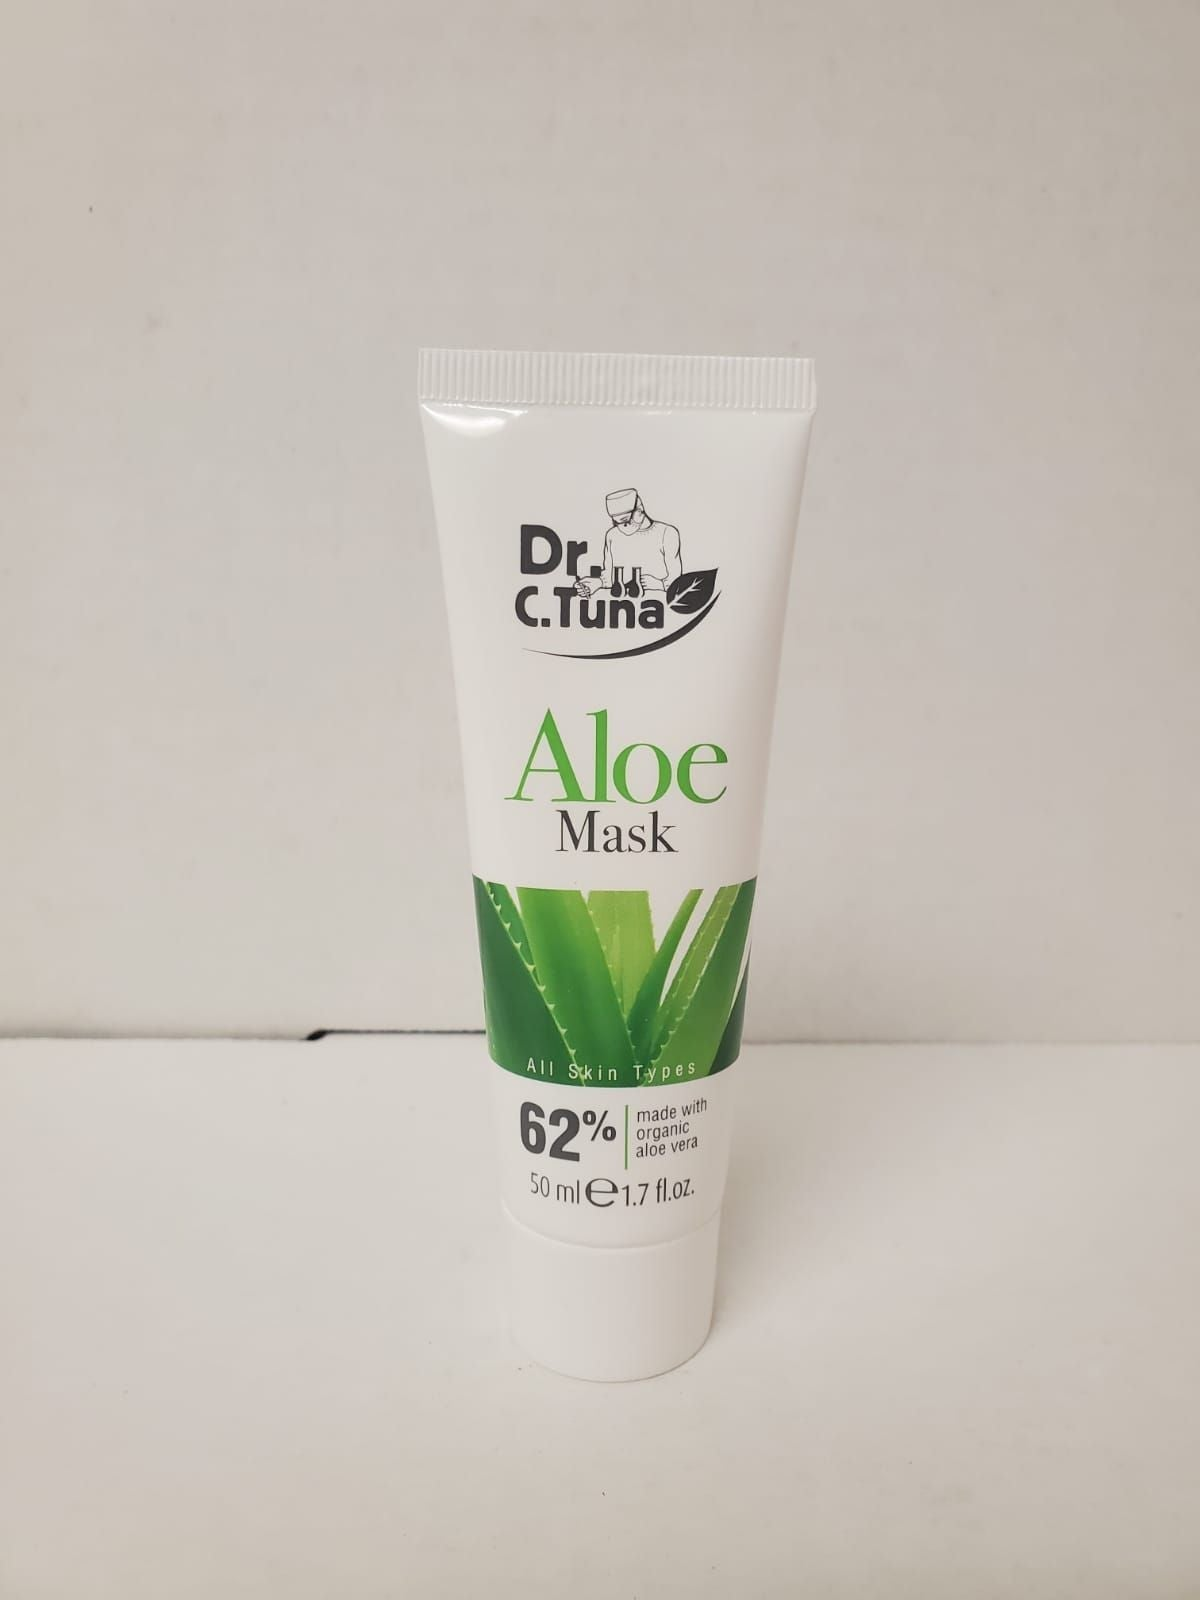 Aloe Mask for all skin types